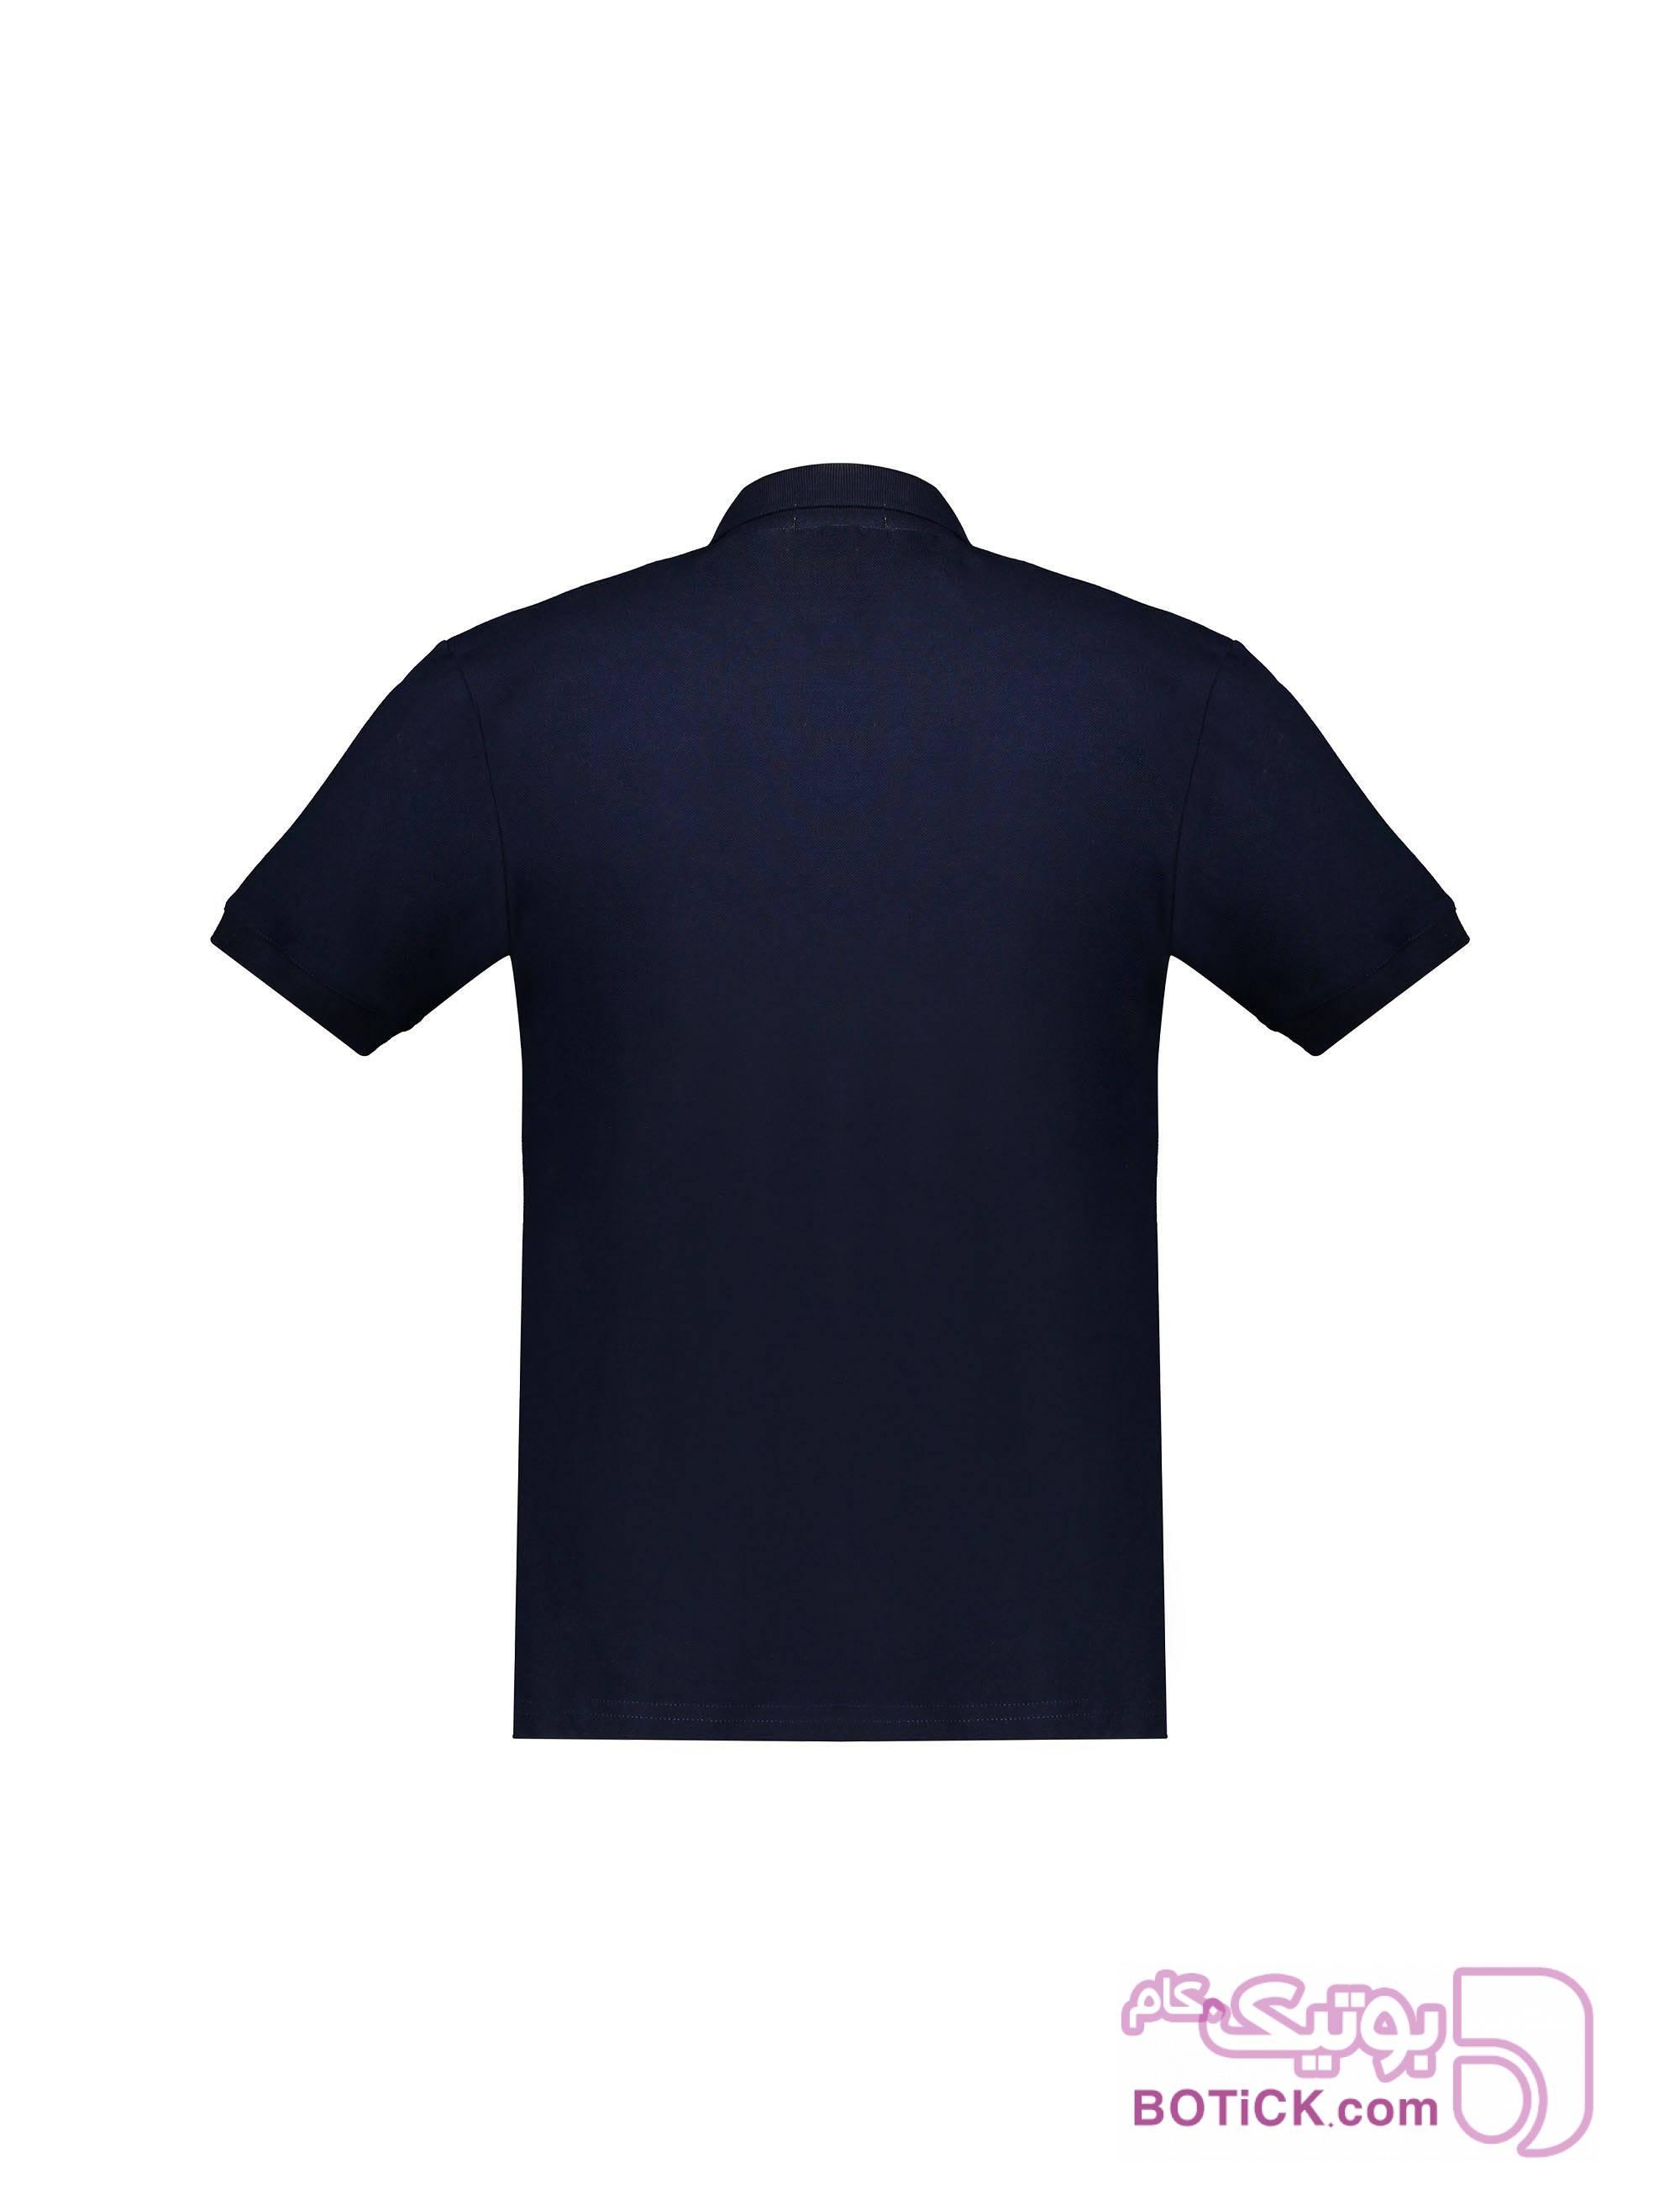 پولوشرت نخی آستین کوتاه مردانه سورمه ای تی شرت و پولو شرت مردانه